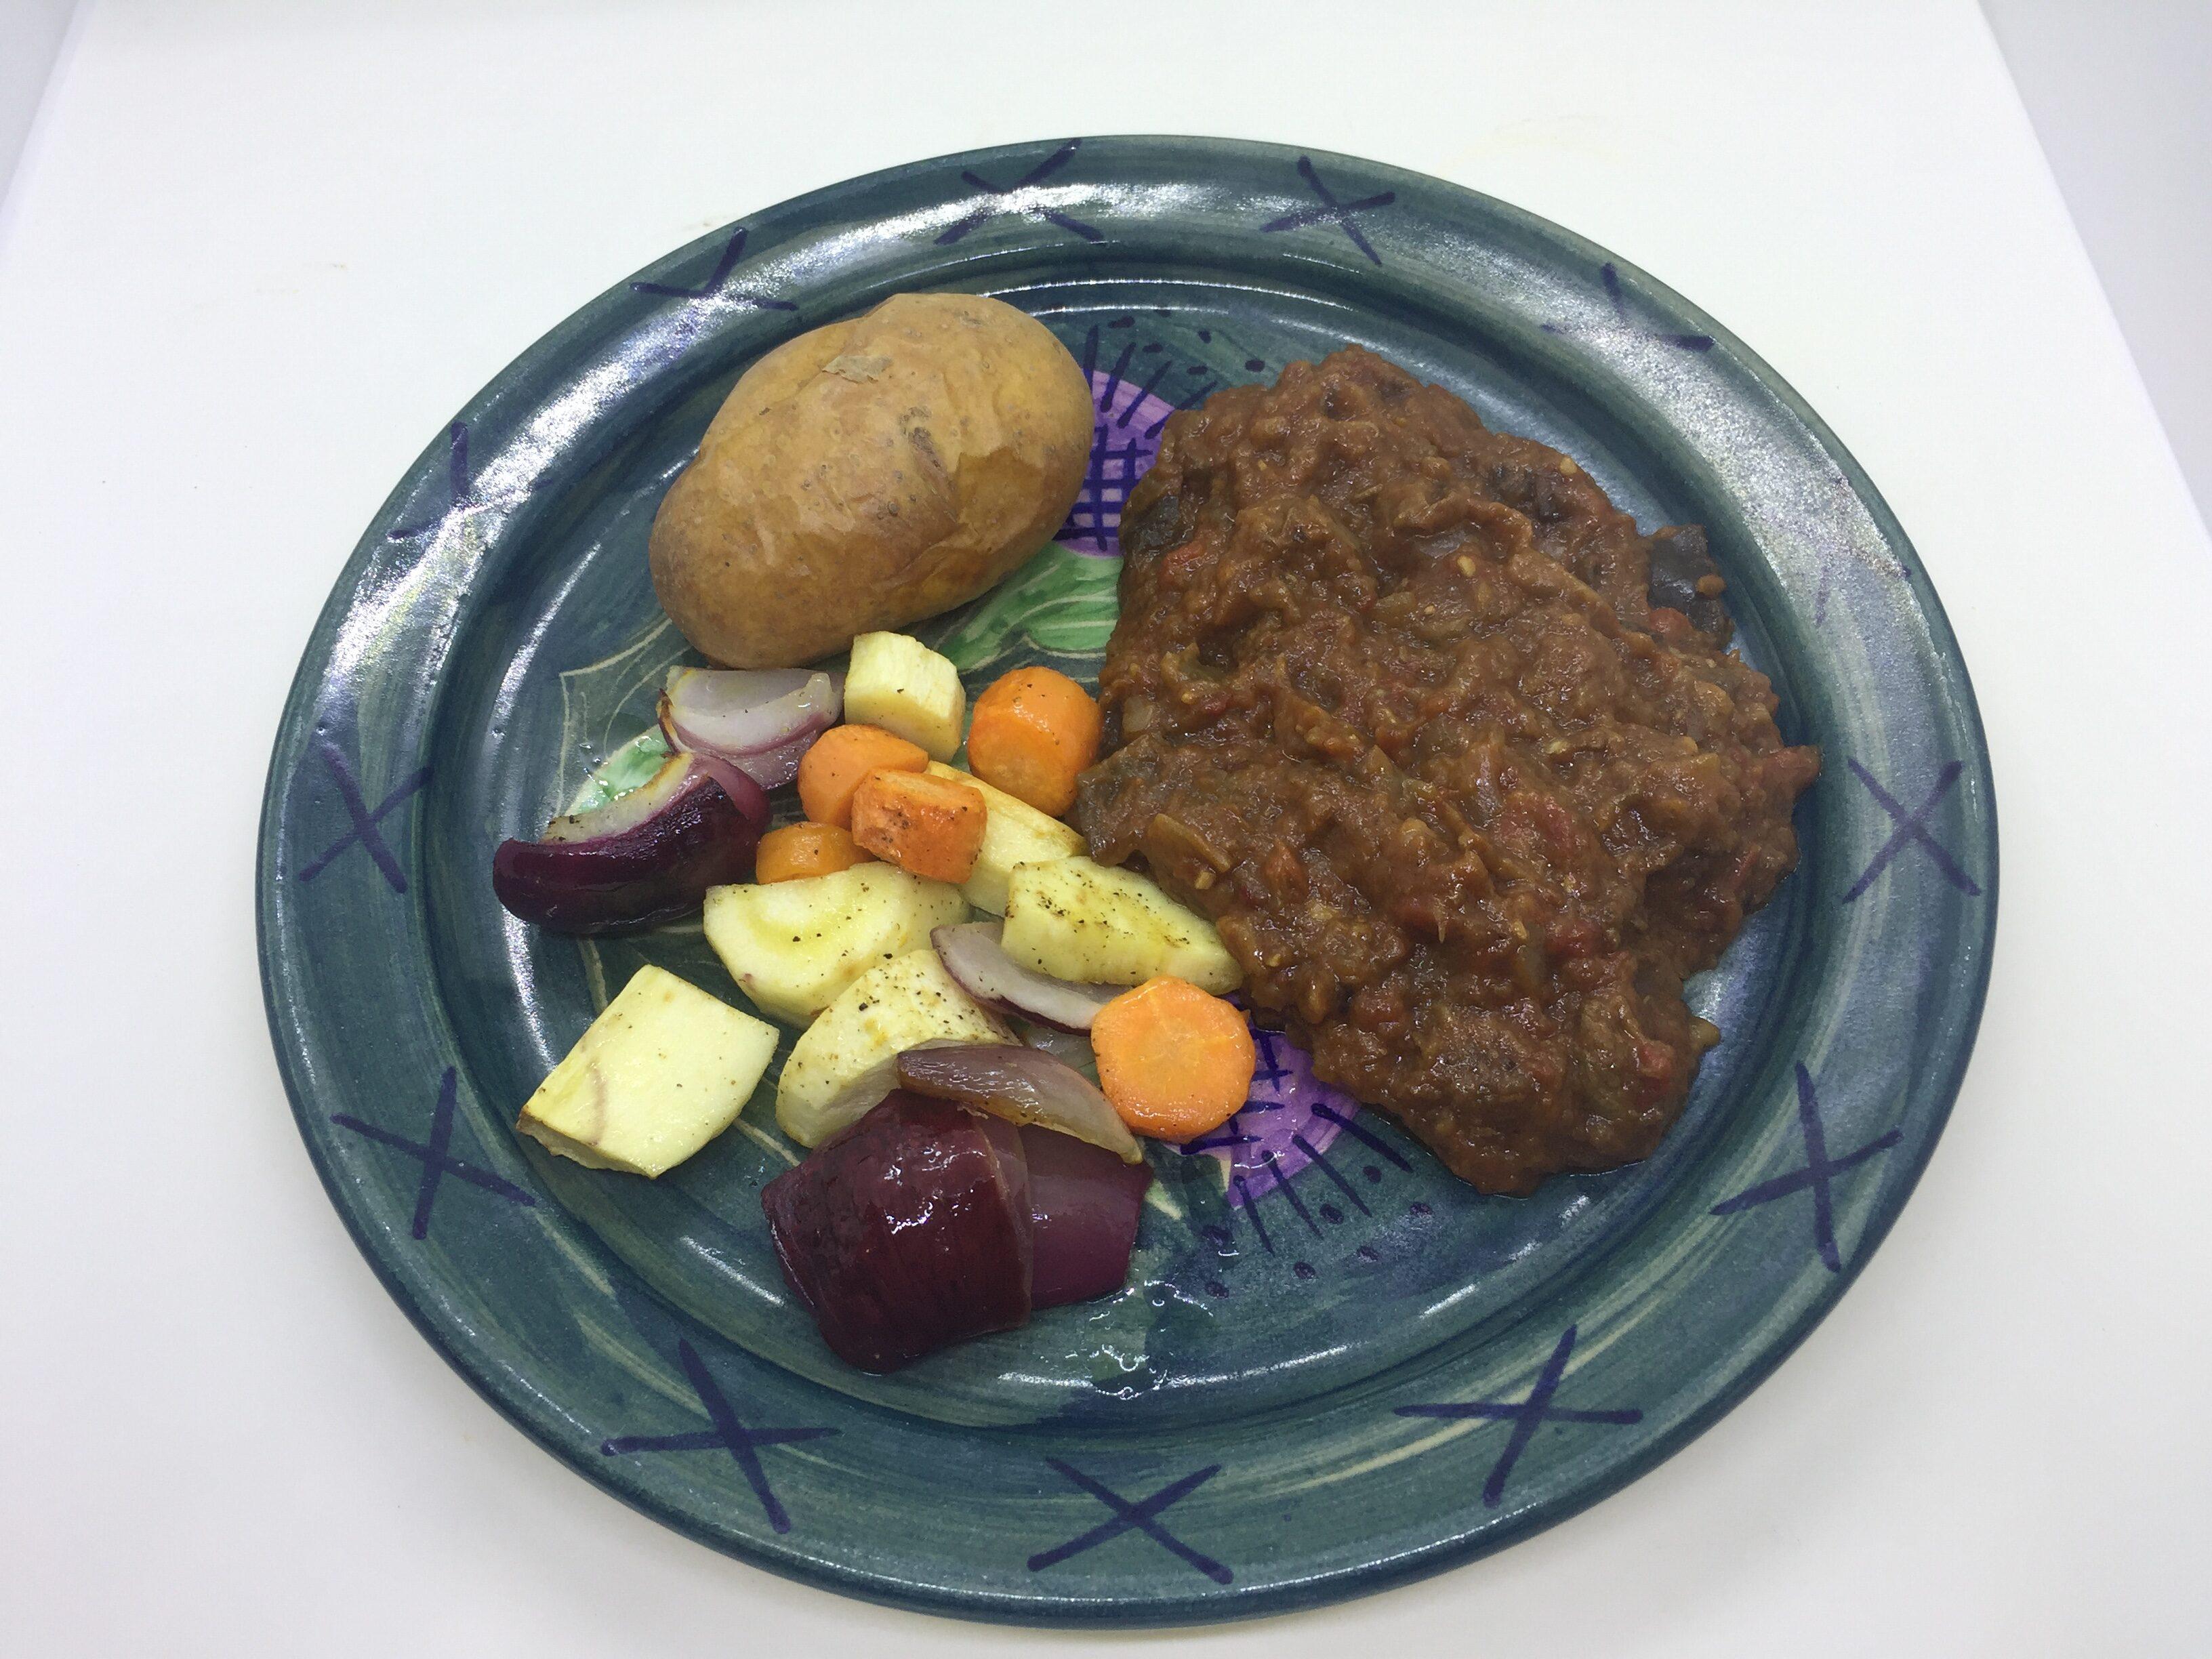 Moroccan beef casserole